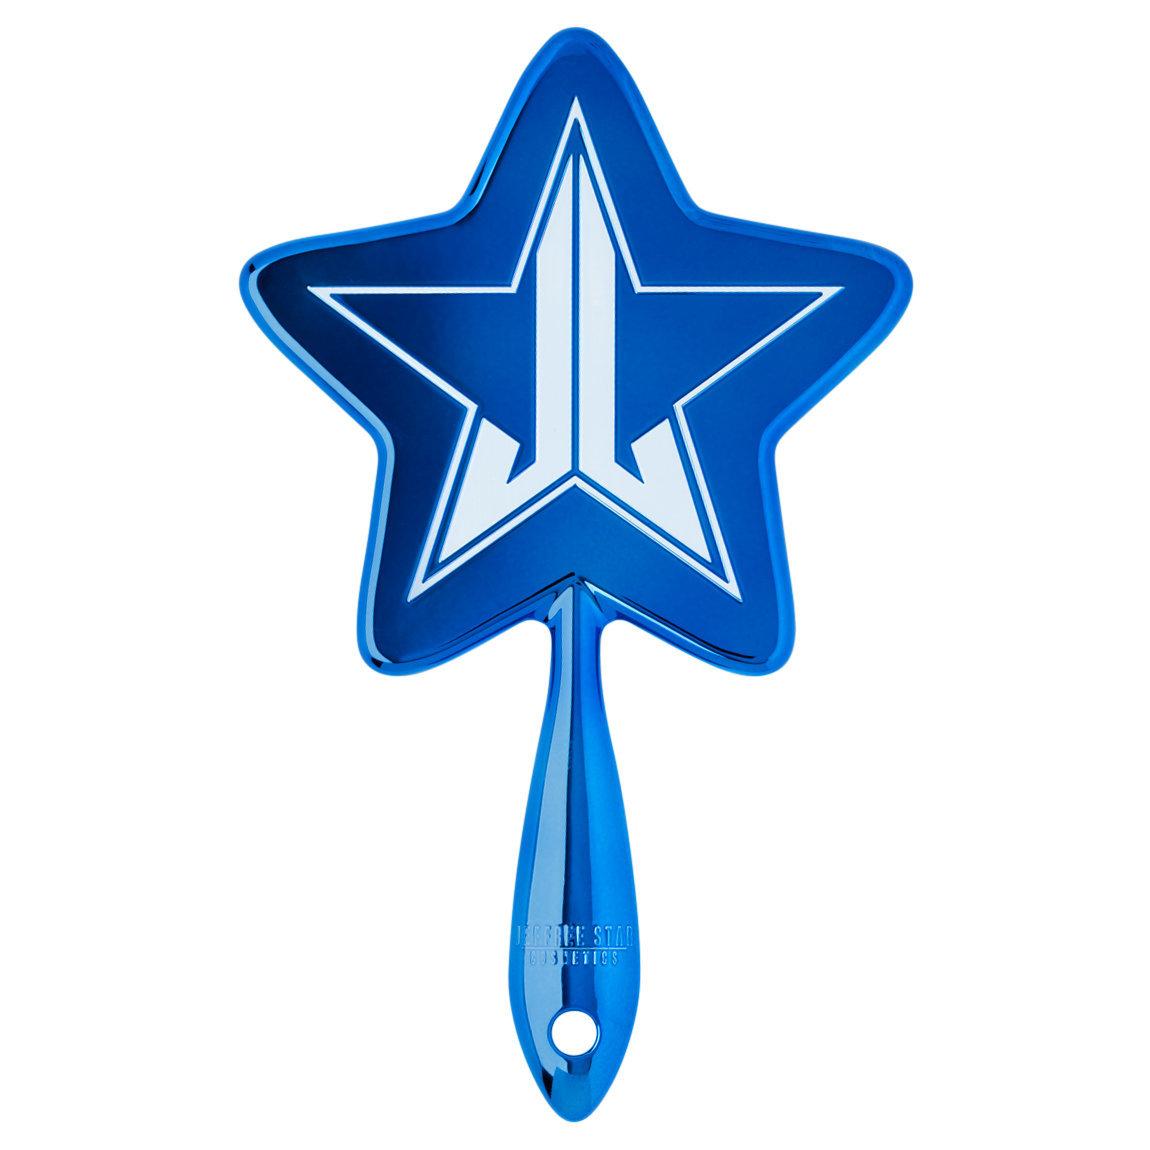 Jeffree Star Cosmetics Star Mirror Blue Chrome product swatch.